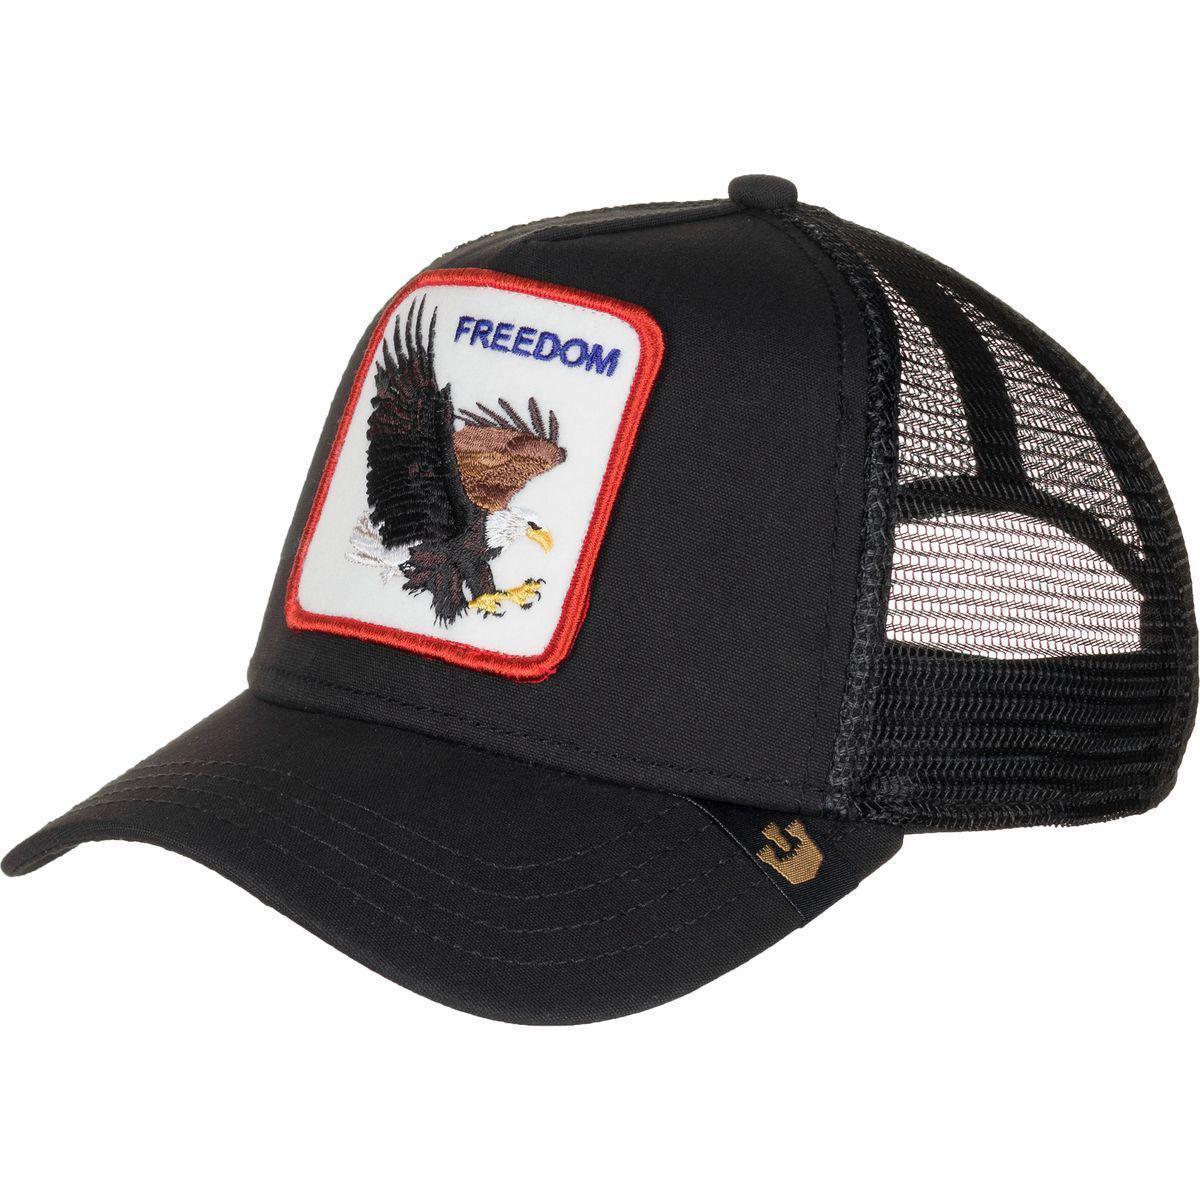 e8ae3573ad Lyst - Goorin Bros Freedom Hat in Black for Men